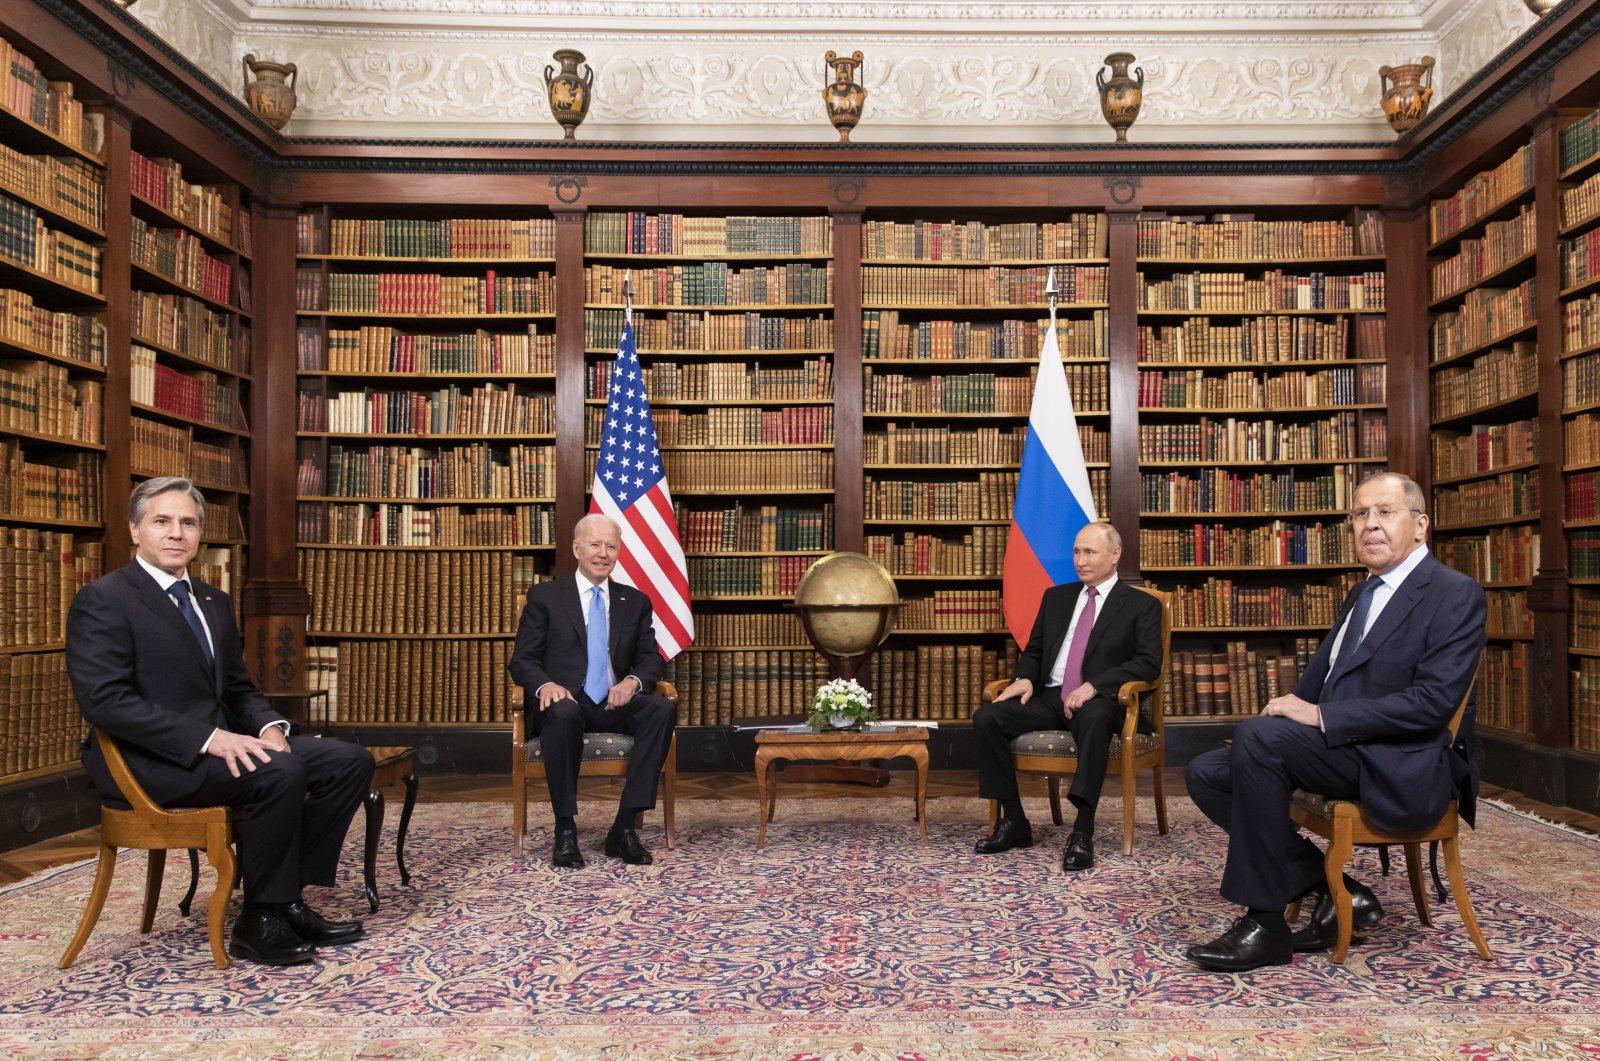 U.S. President Joe Biden (2-L), U.S. Secretary of State Antony Blinken (L), Russian President Vladimir Putin (2-R) and Russian Foreign Minister Sergey Lavrov (R) during their meeting at the U.S.-Russia summit at the Villa La Grange, in Geneva, Switzerland, June 16, 2021. (EPA Photo)